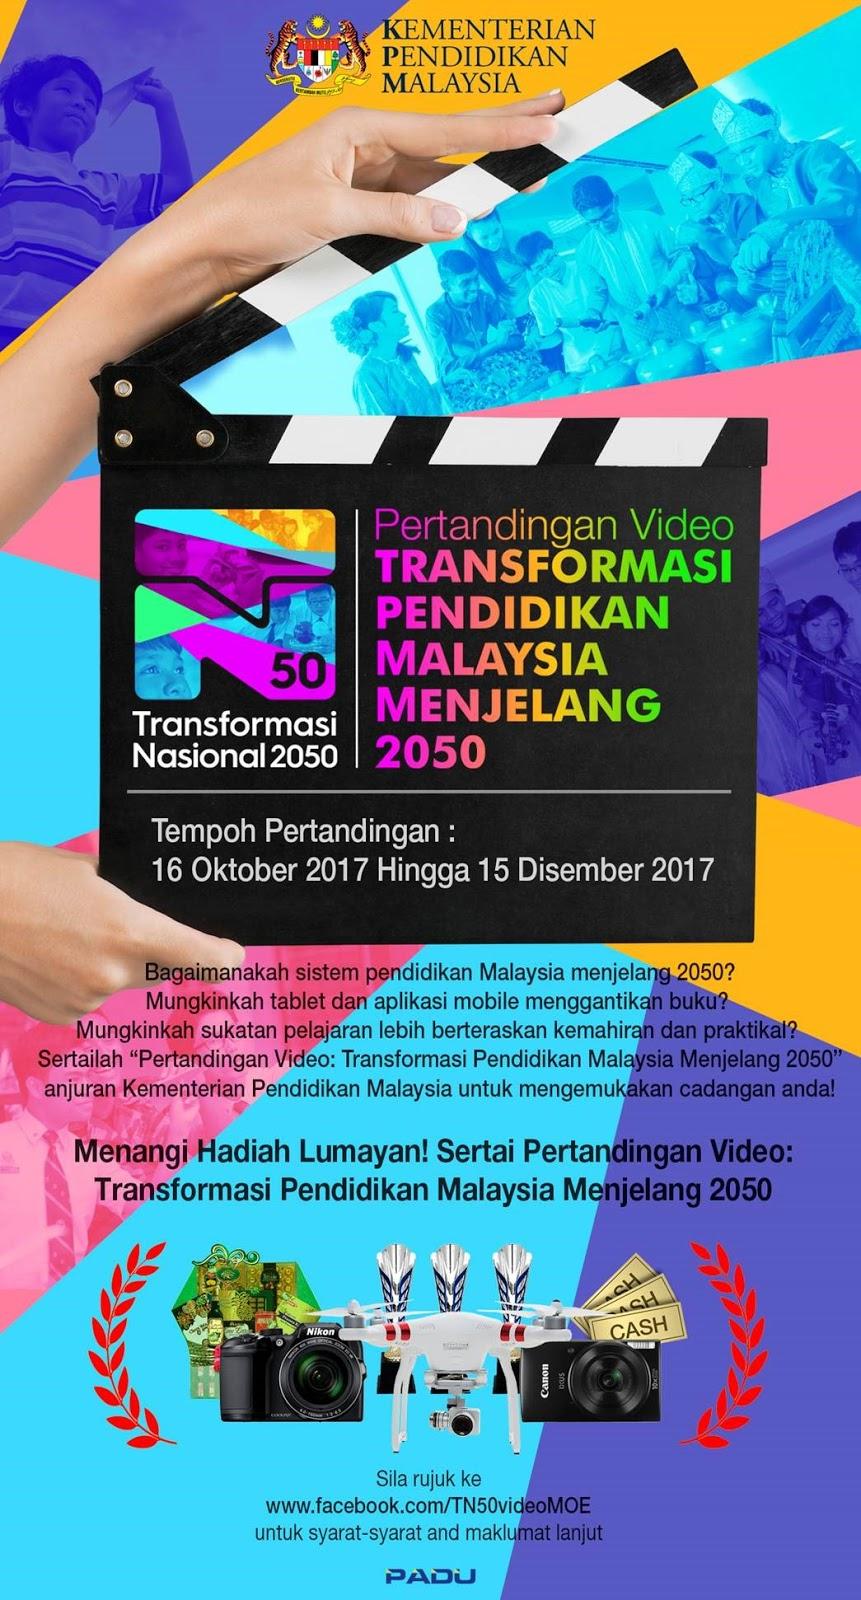 Pertandingan Video Transformasi Pendidikan Malaysia Menjelang 2050